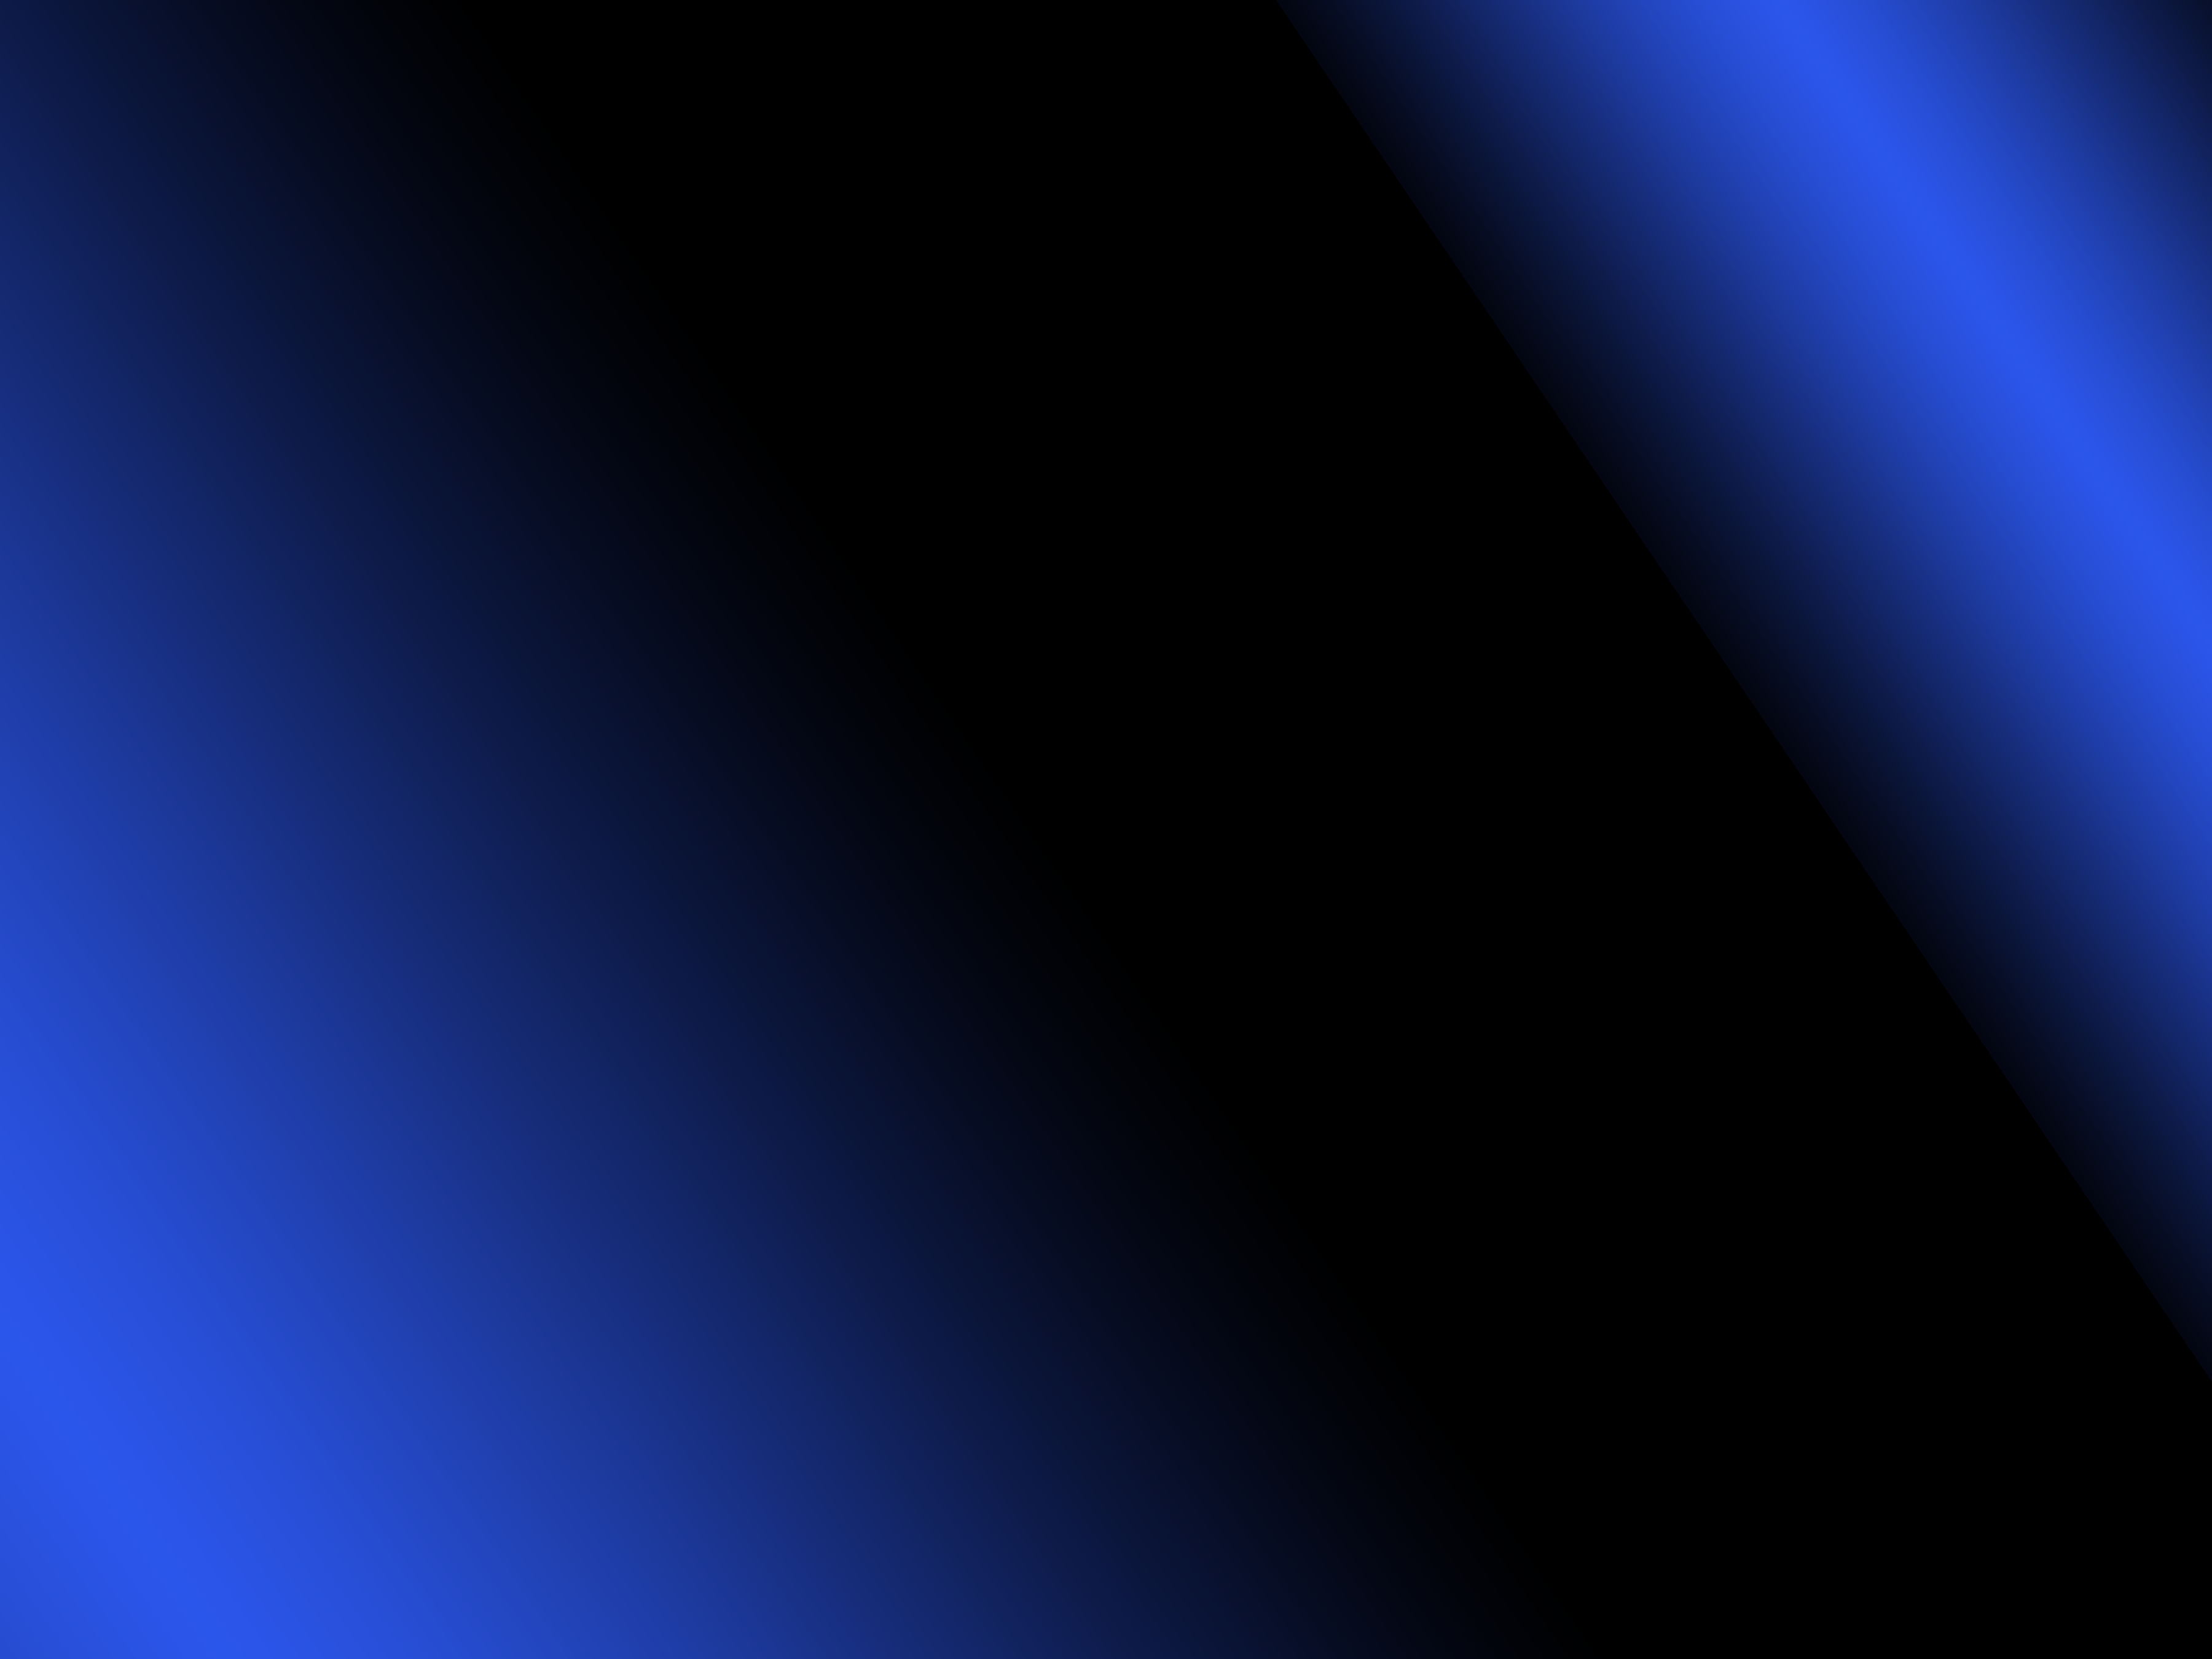 Neon Blue Wallpapers 3600x2700